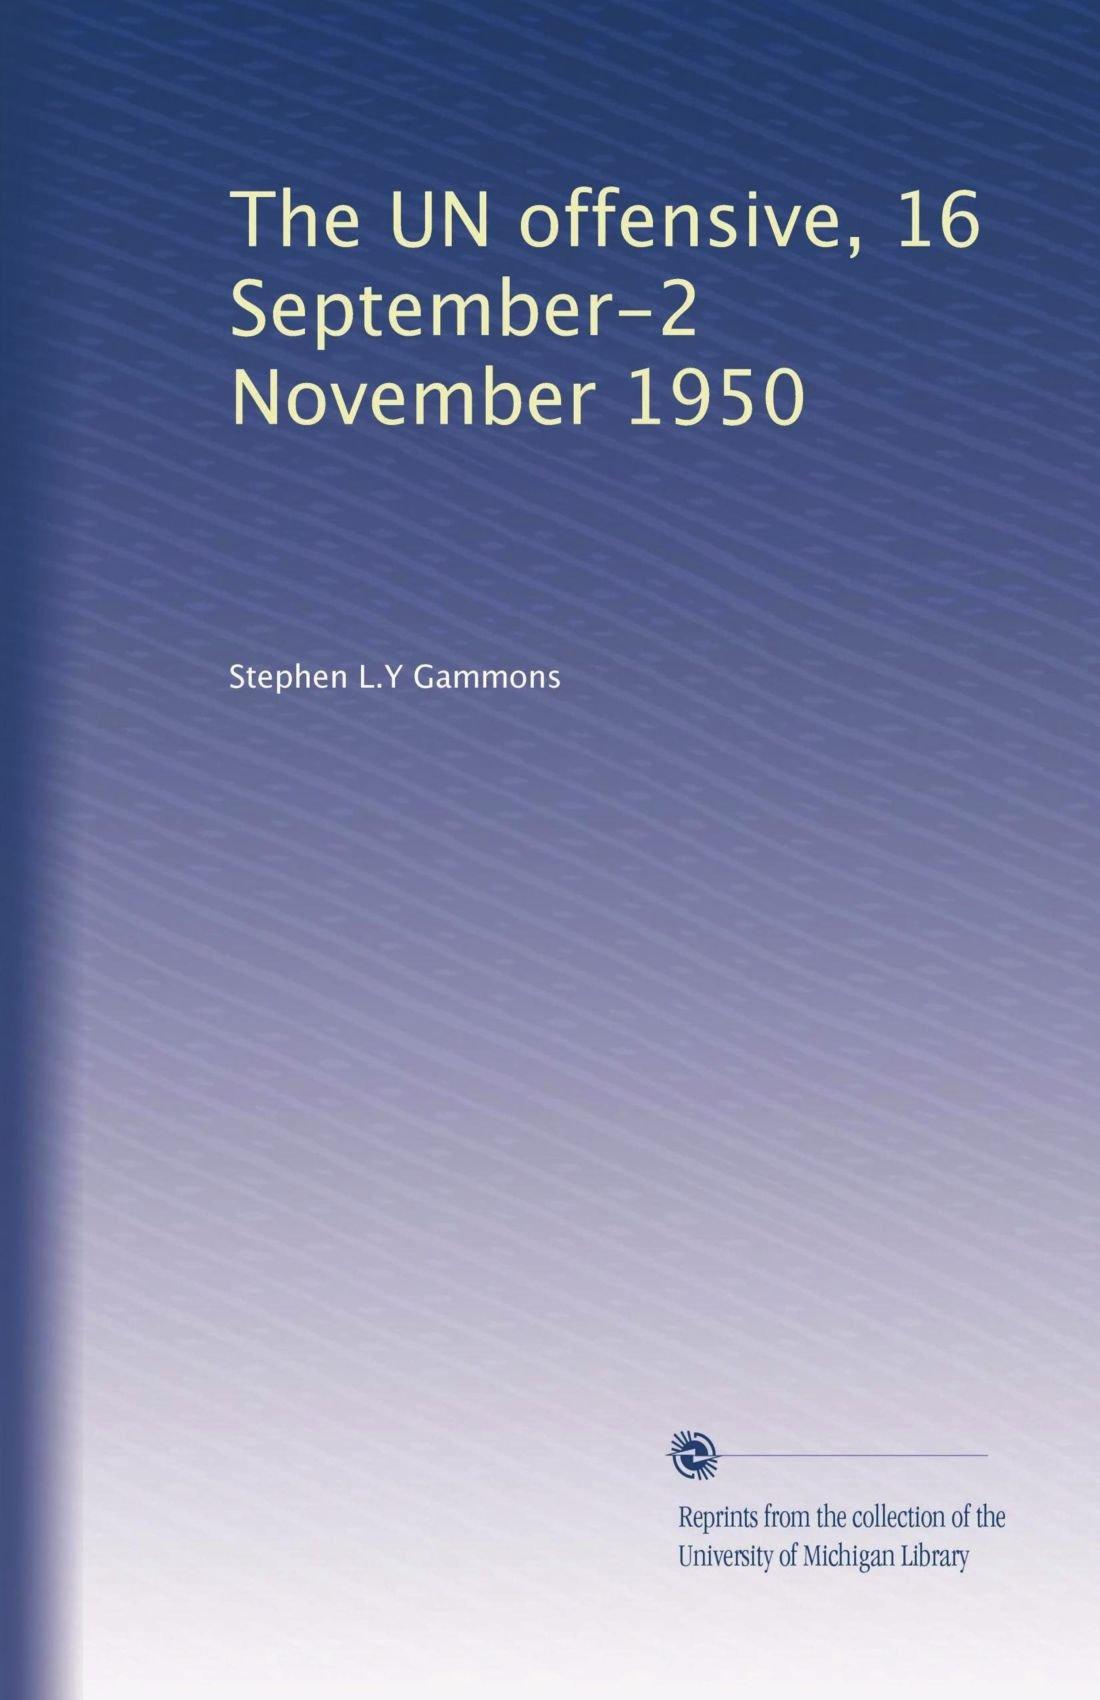 Download The UN offensive, 16 September-2 November 1950 pdf